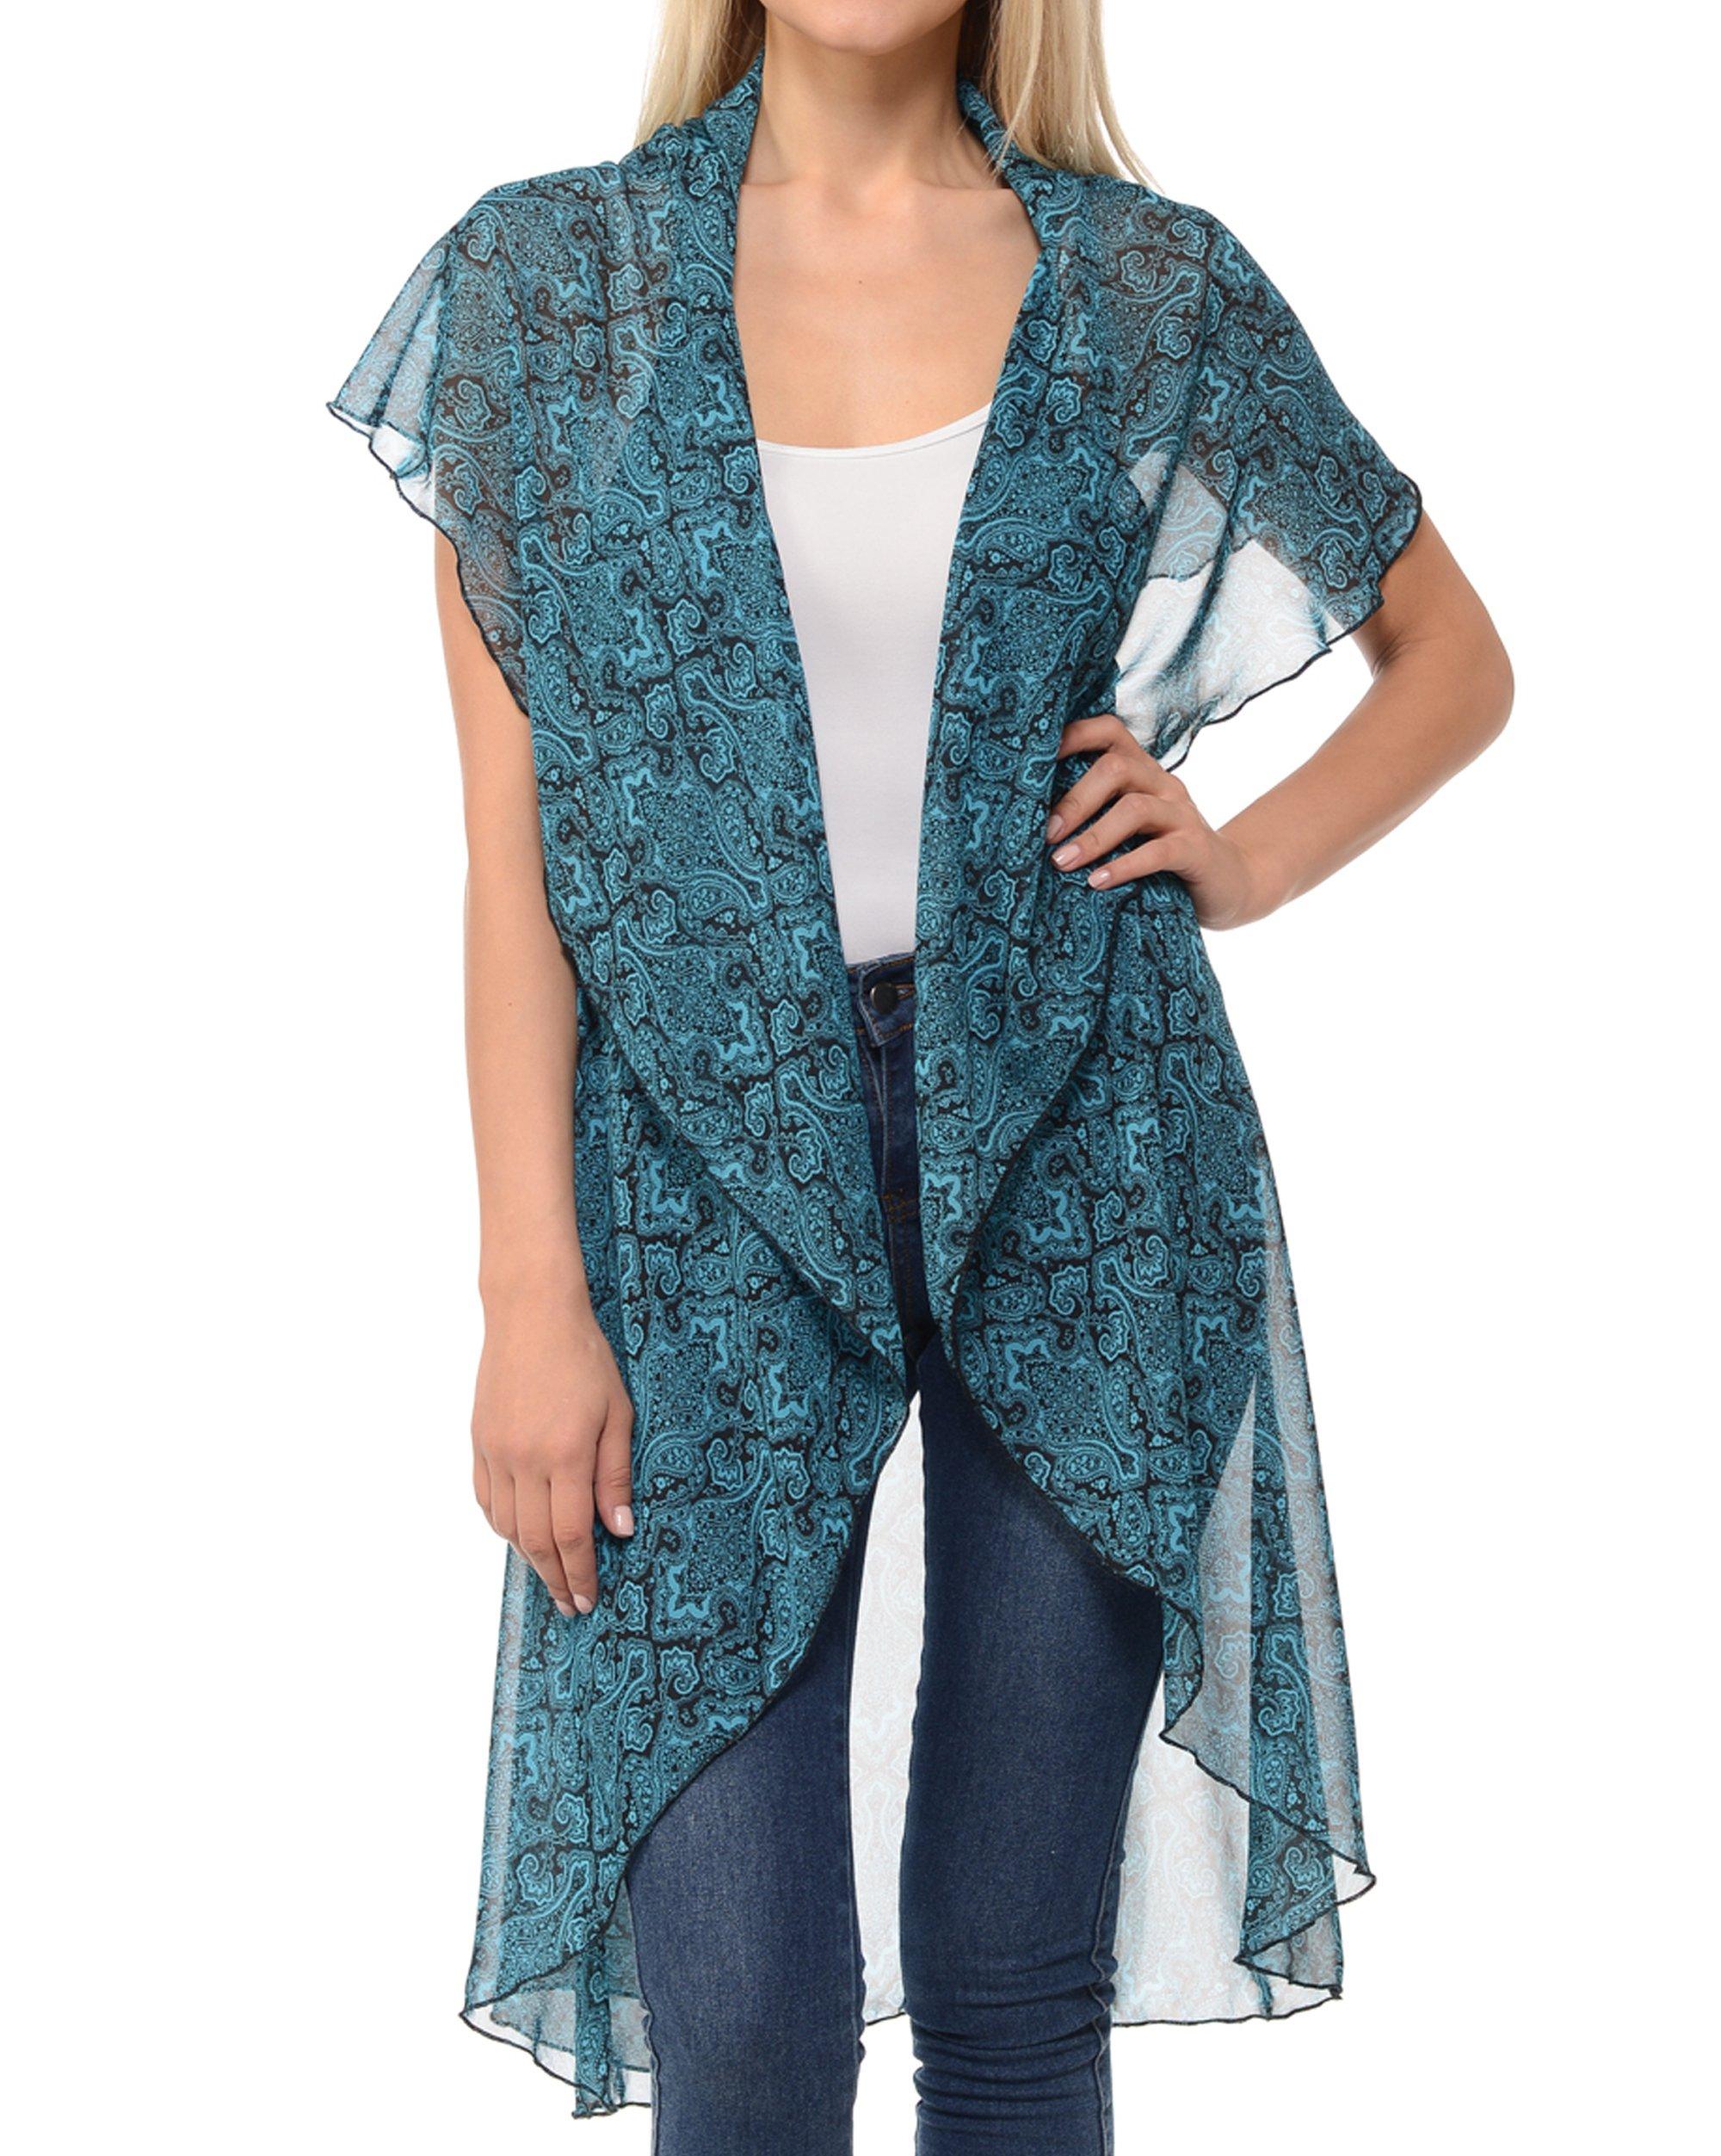 Basico Women's Open Asymmetrical Hem Print Chiffon Vest Cardigan (Small/ Medium, Vest Cape- Teal/ Paisley)